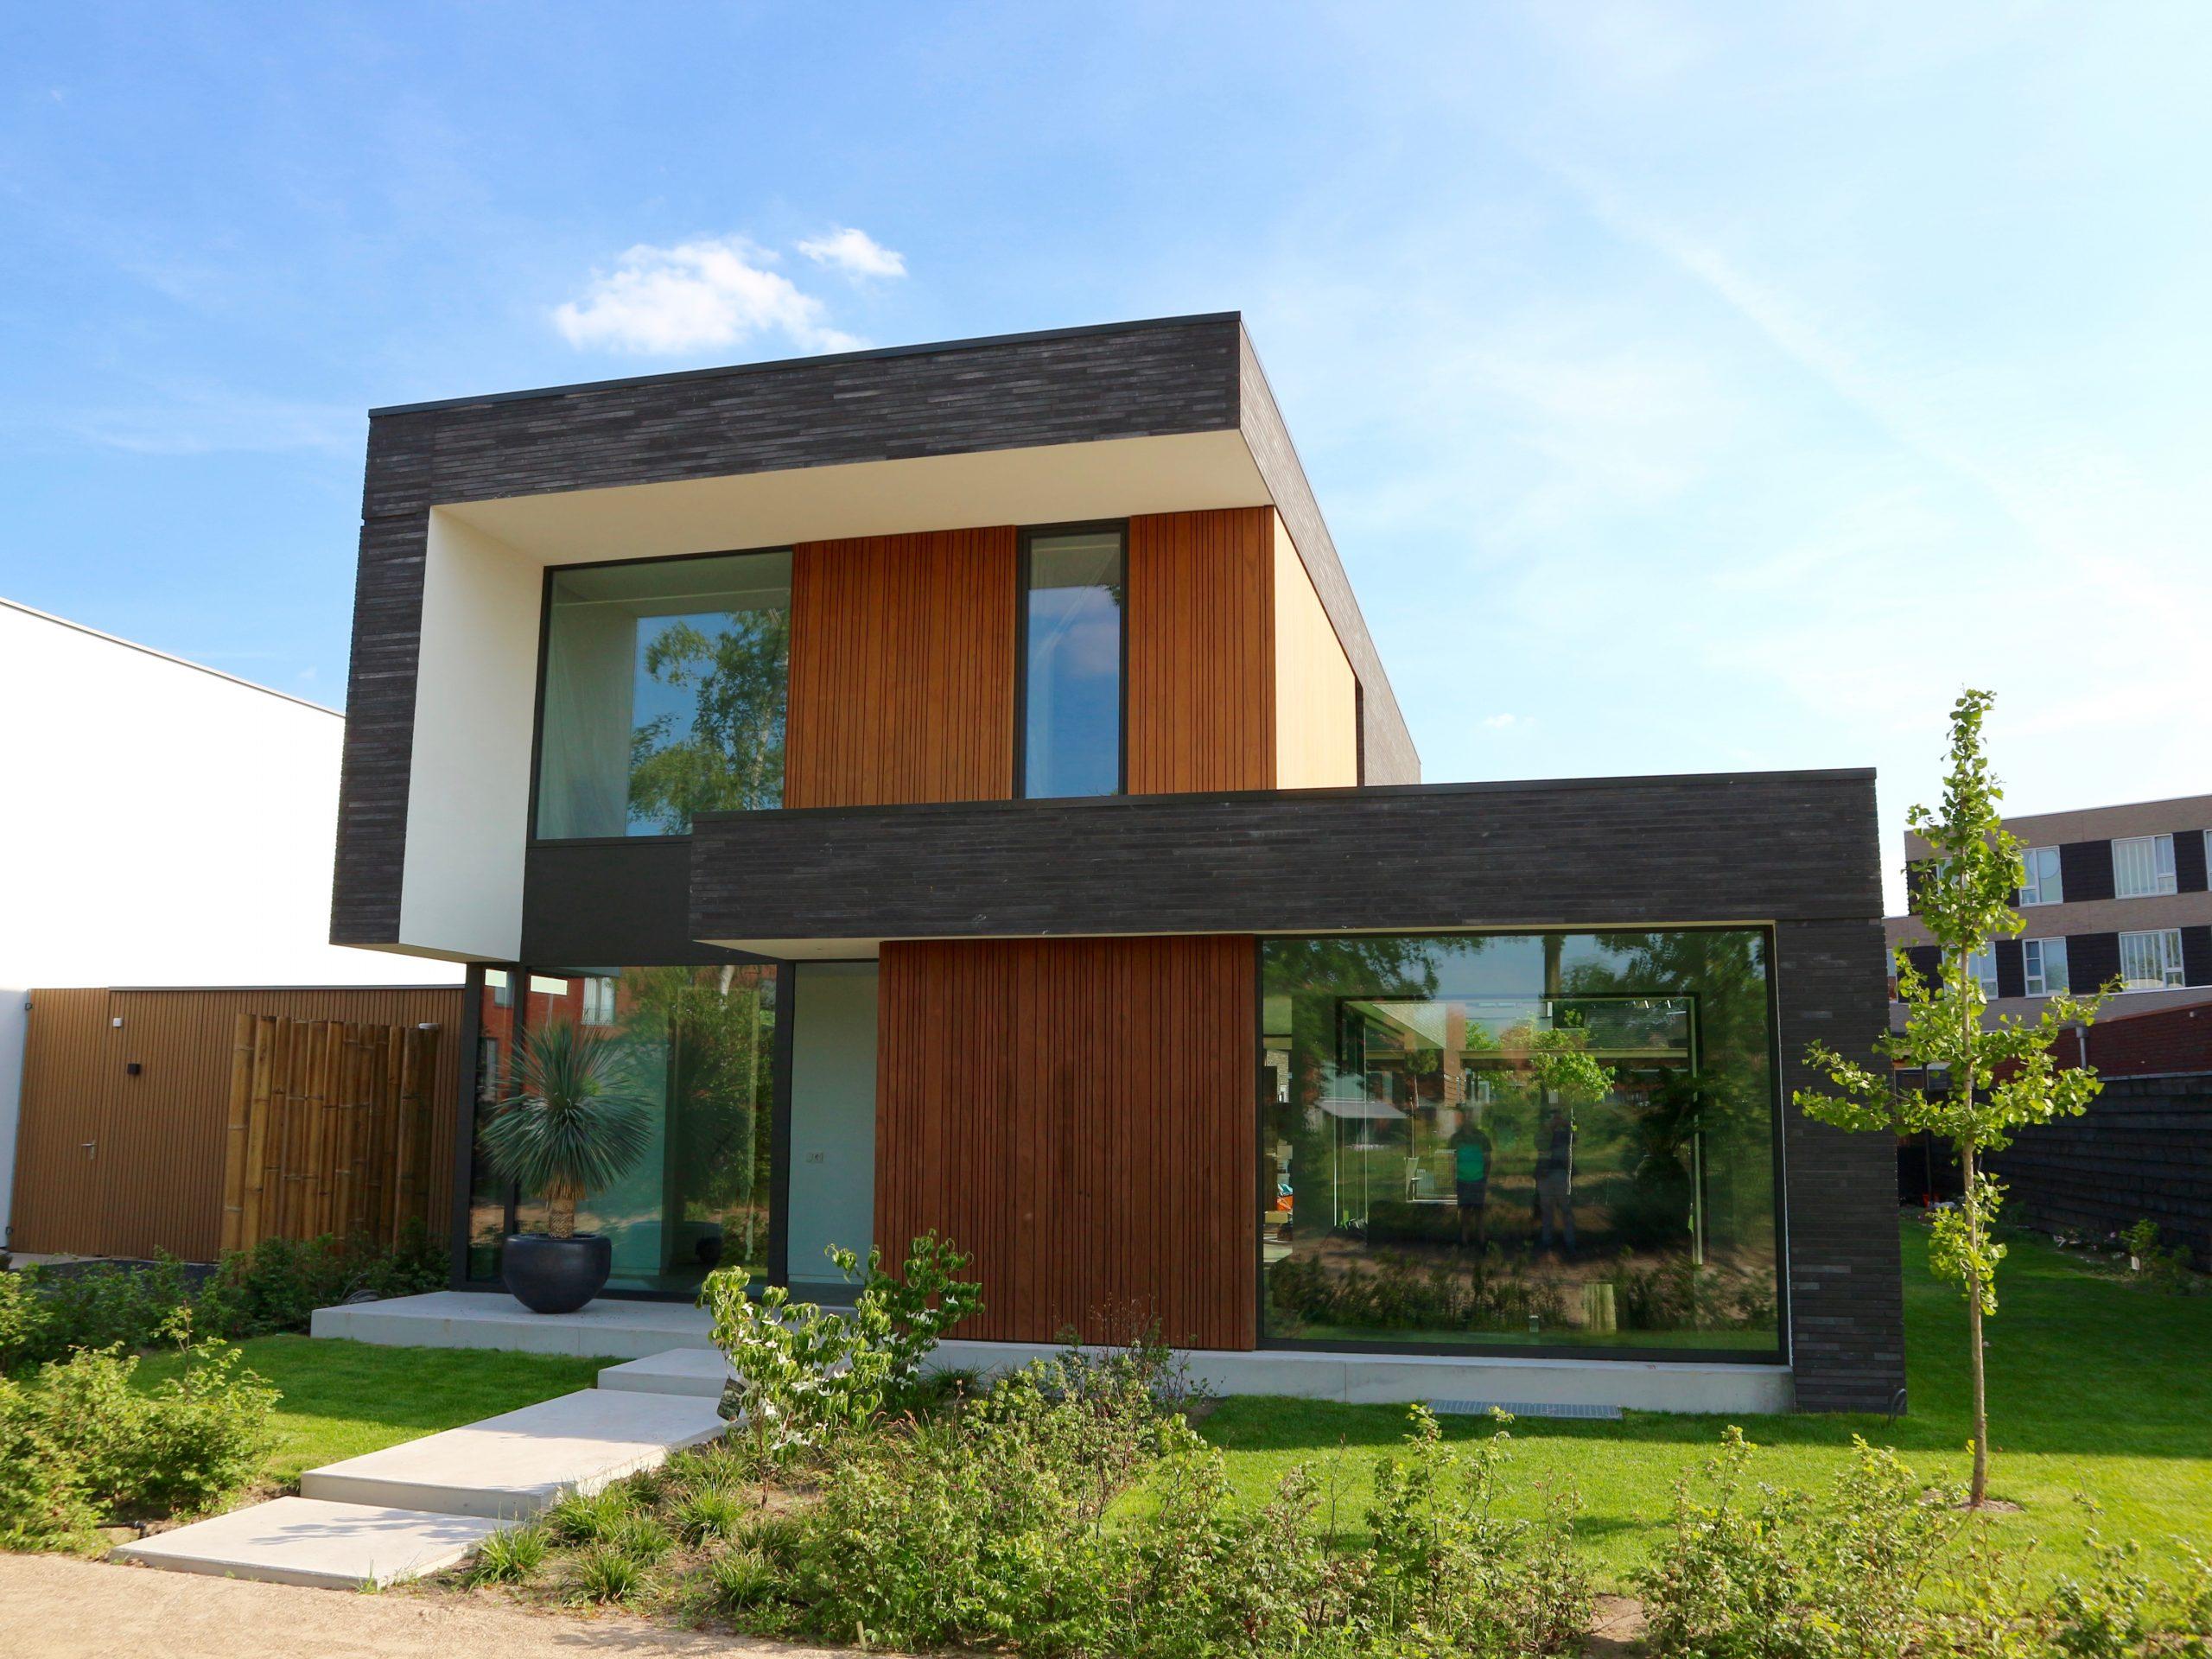 villa swkls architects